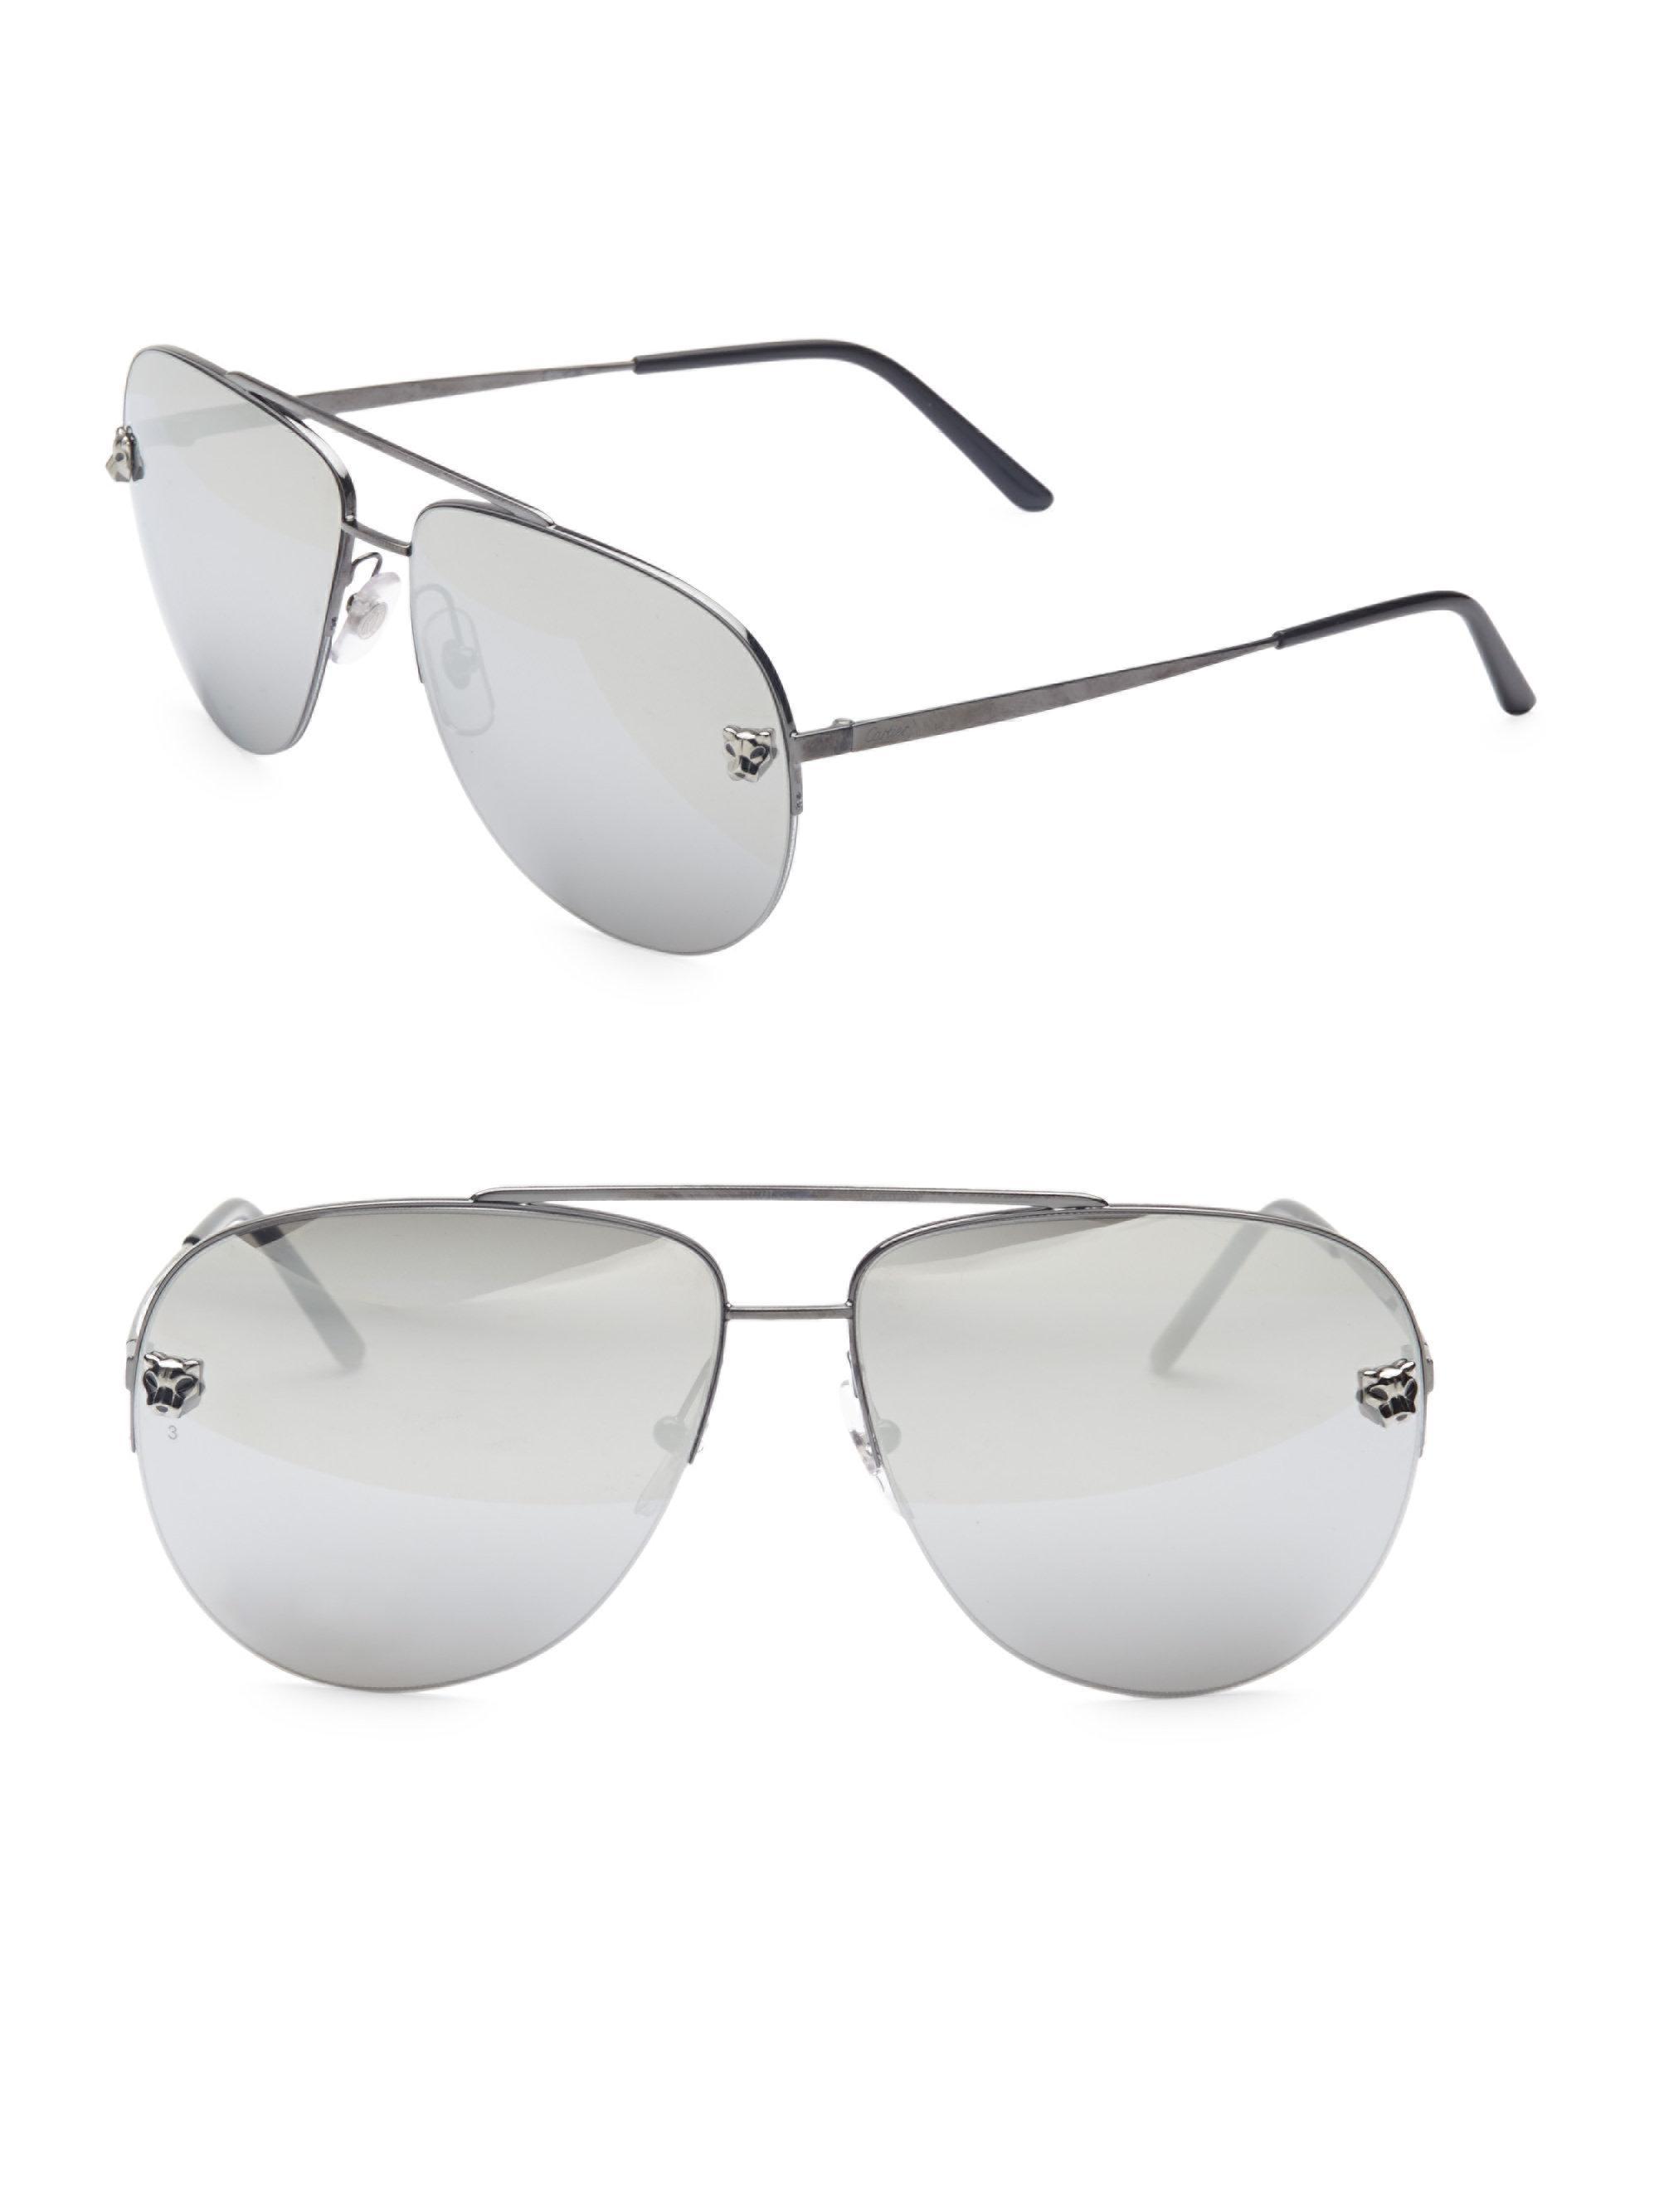 3c94b44272734 Cartier Women s Panthere Pilot Sunglasses - Black in Black - Lyst